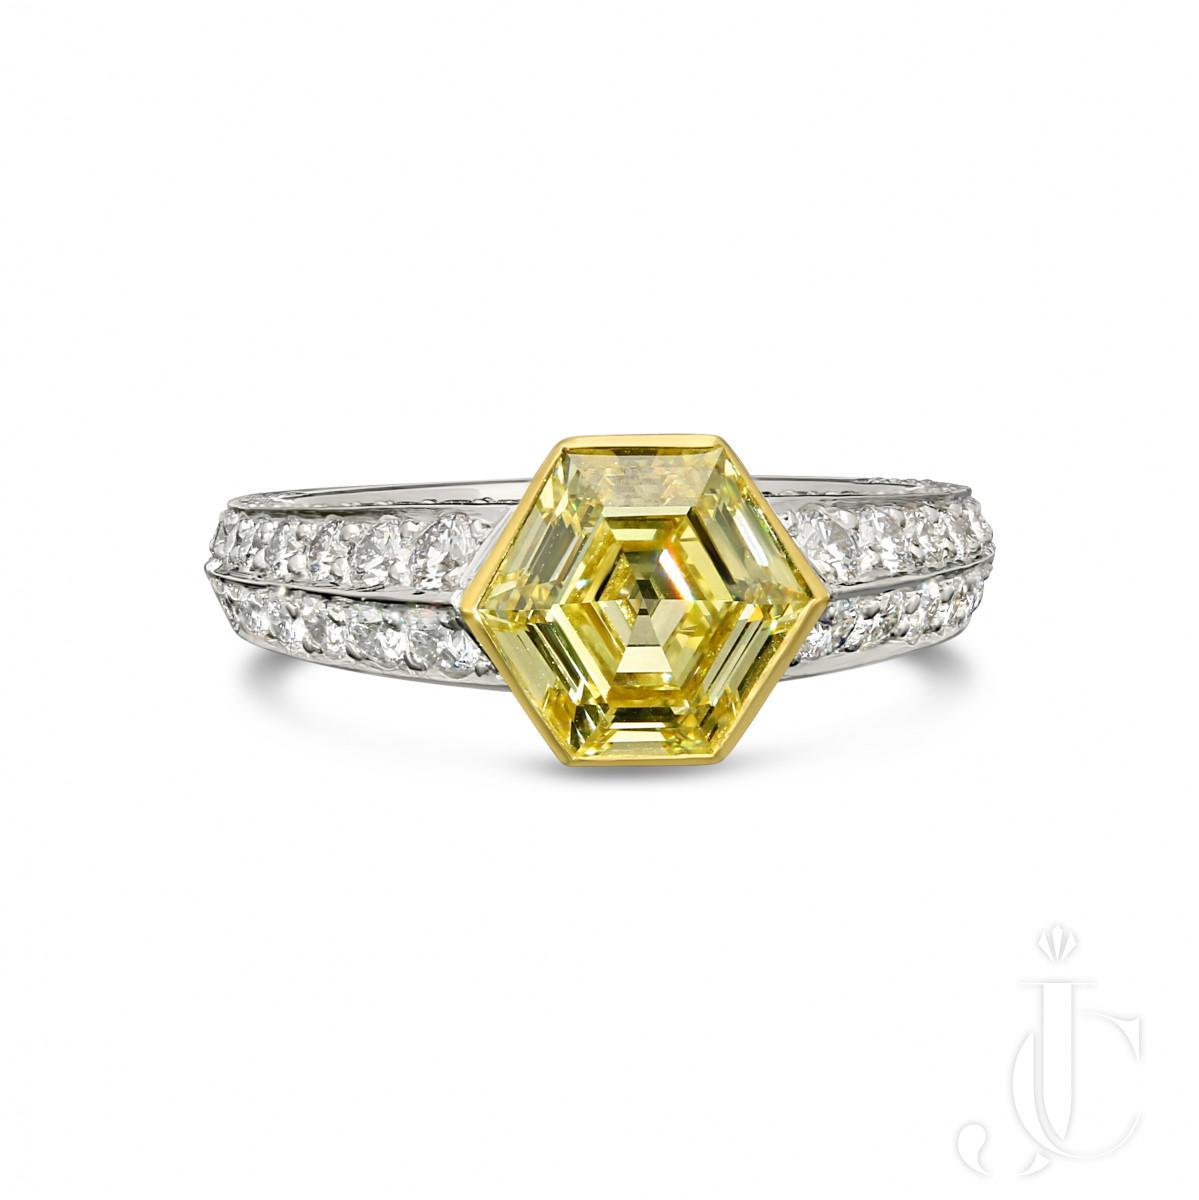 1.56ct FY VVS1 Old Hexagonal Step Cut Diamond ring